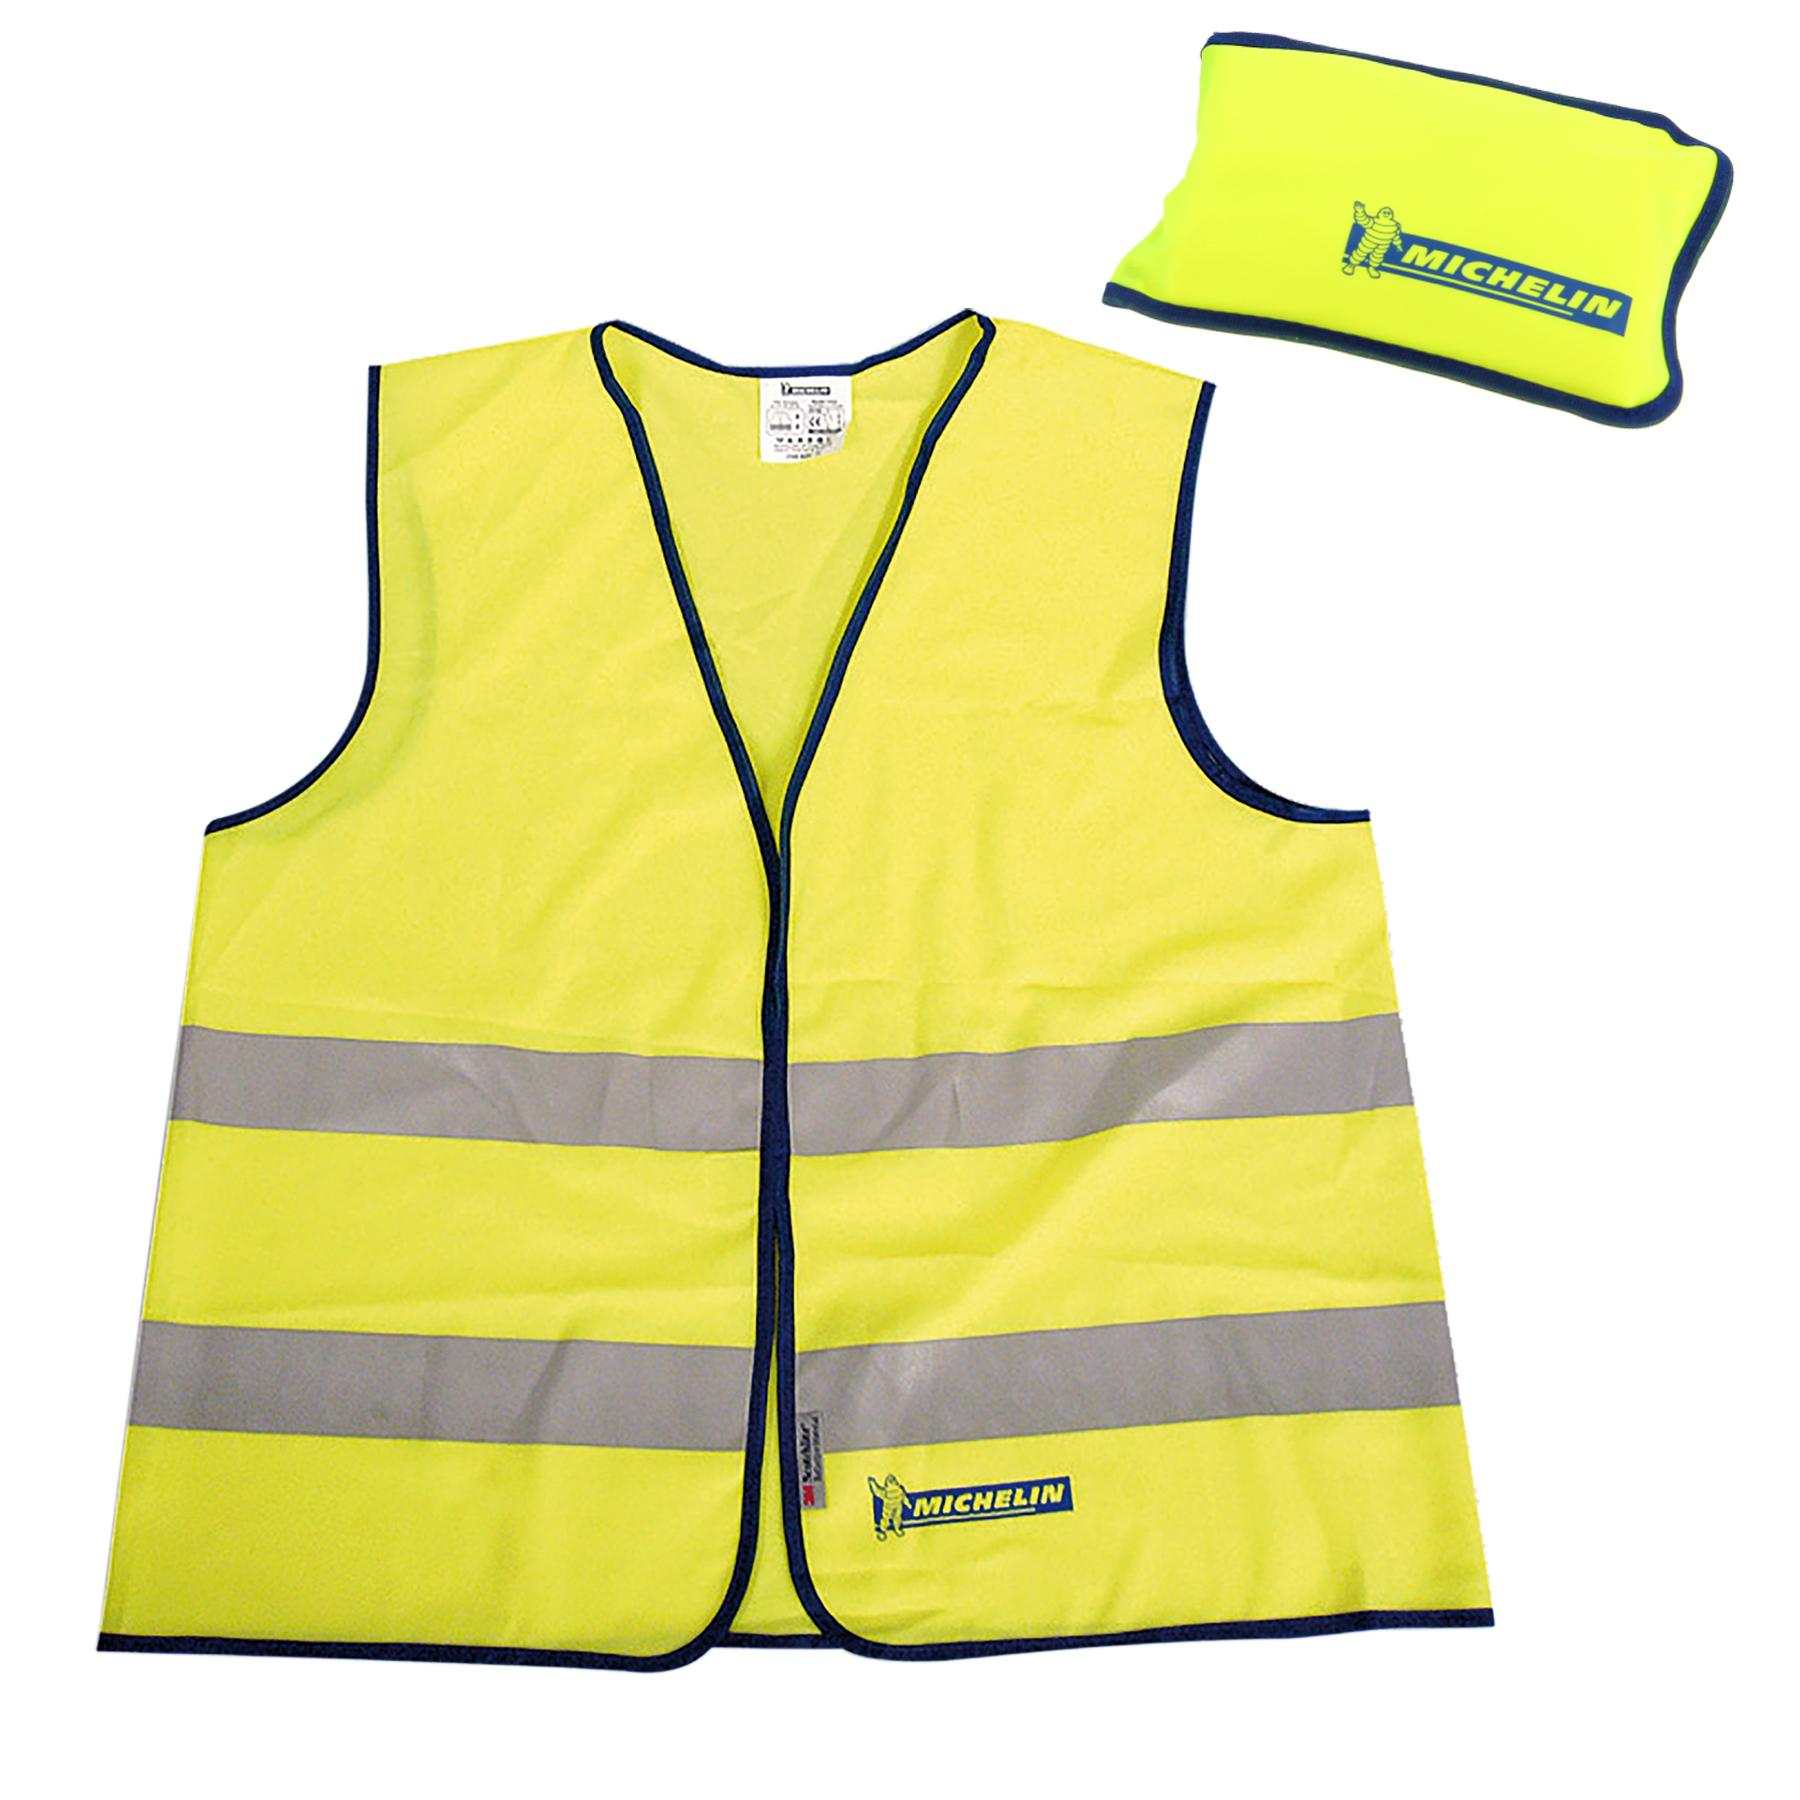 High-visibility vest 009534 Michelin 009534 original quality